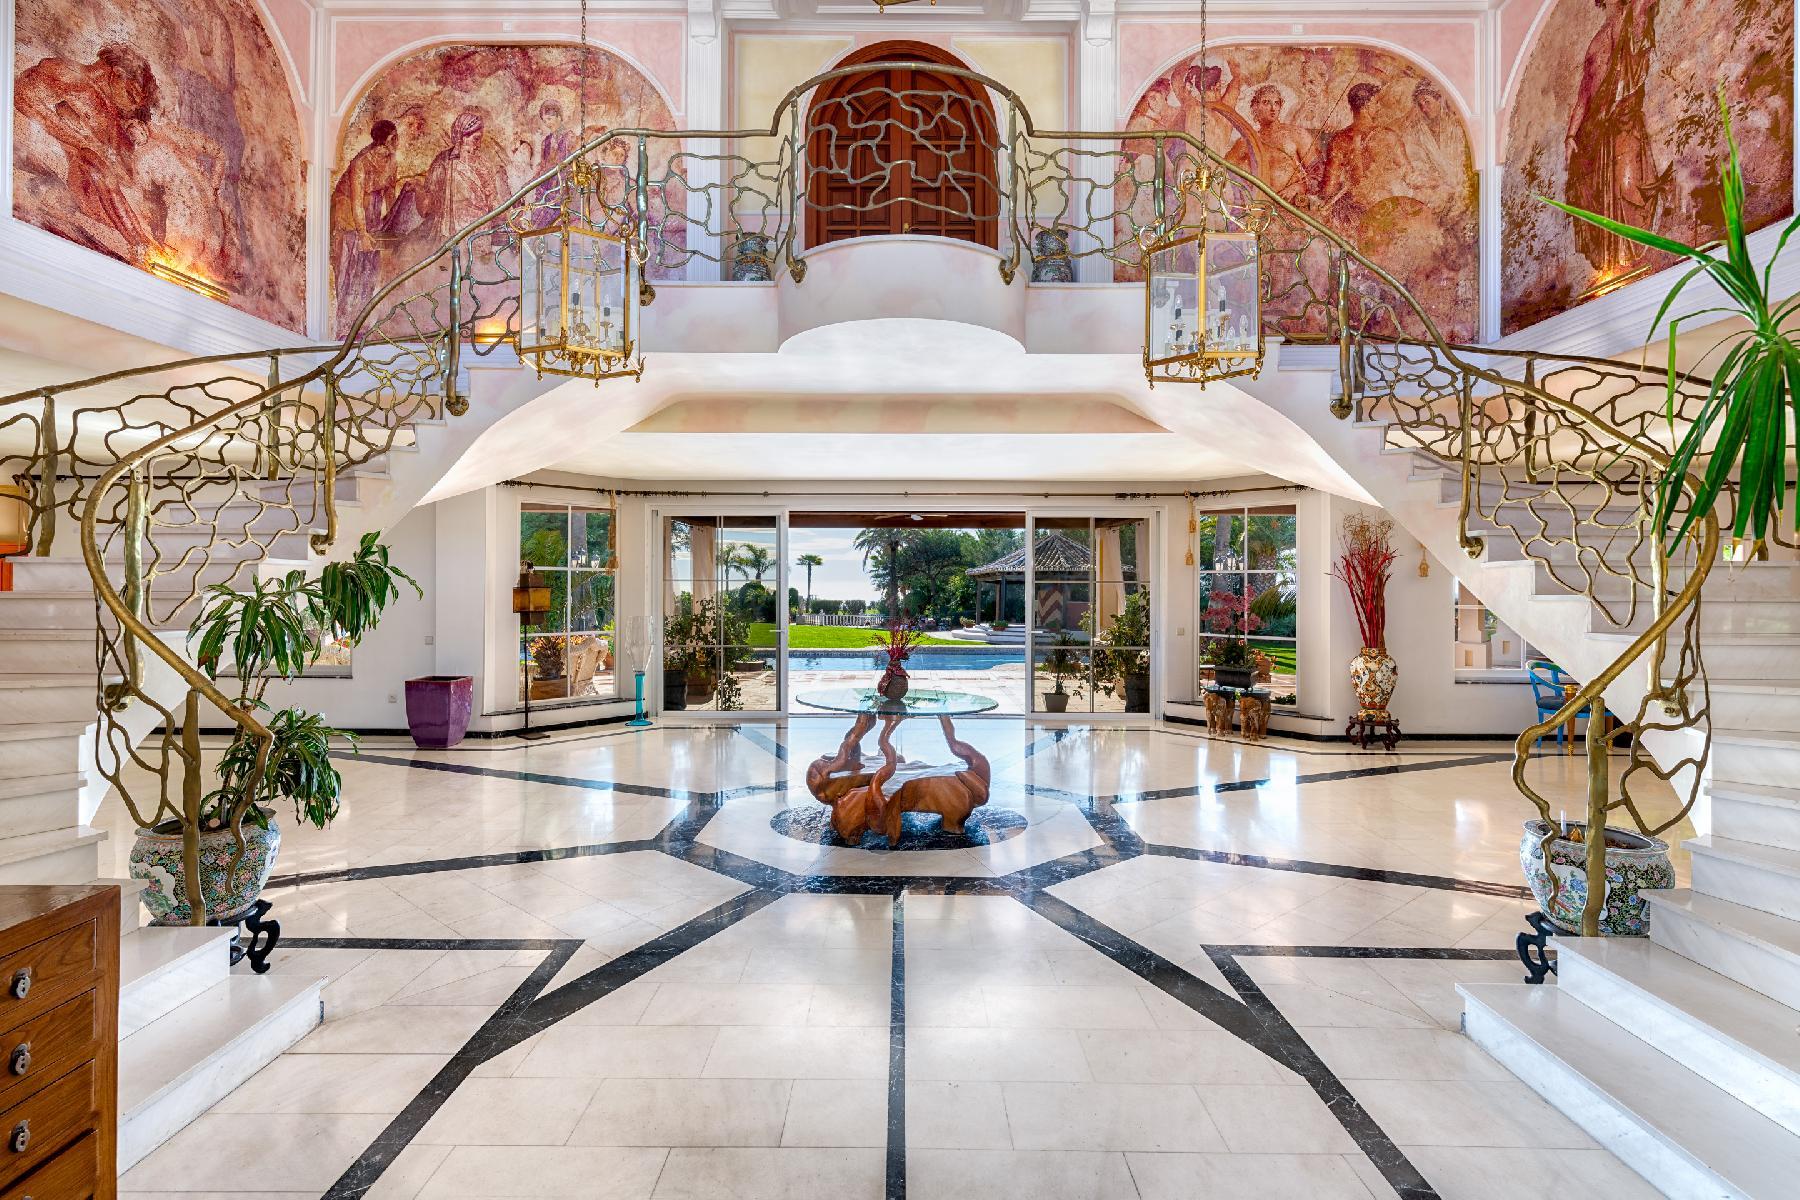 Luxury Villa Flamenca, The Gem of Marbella